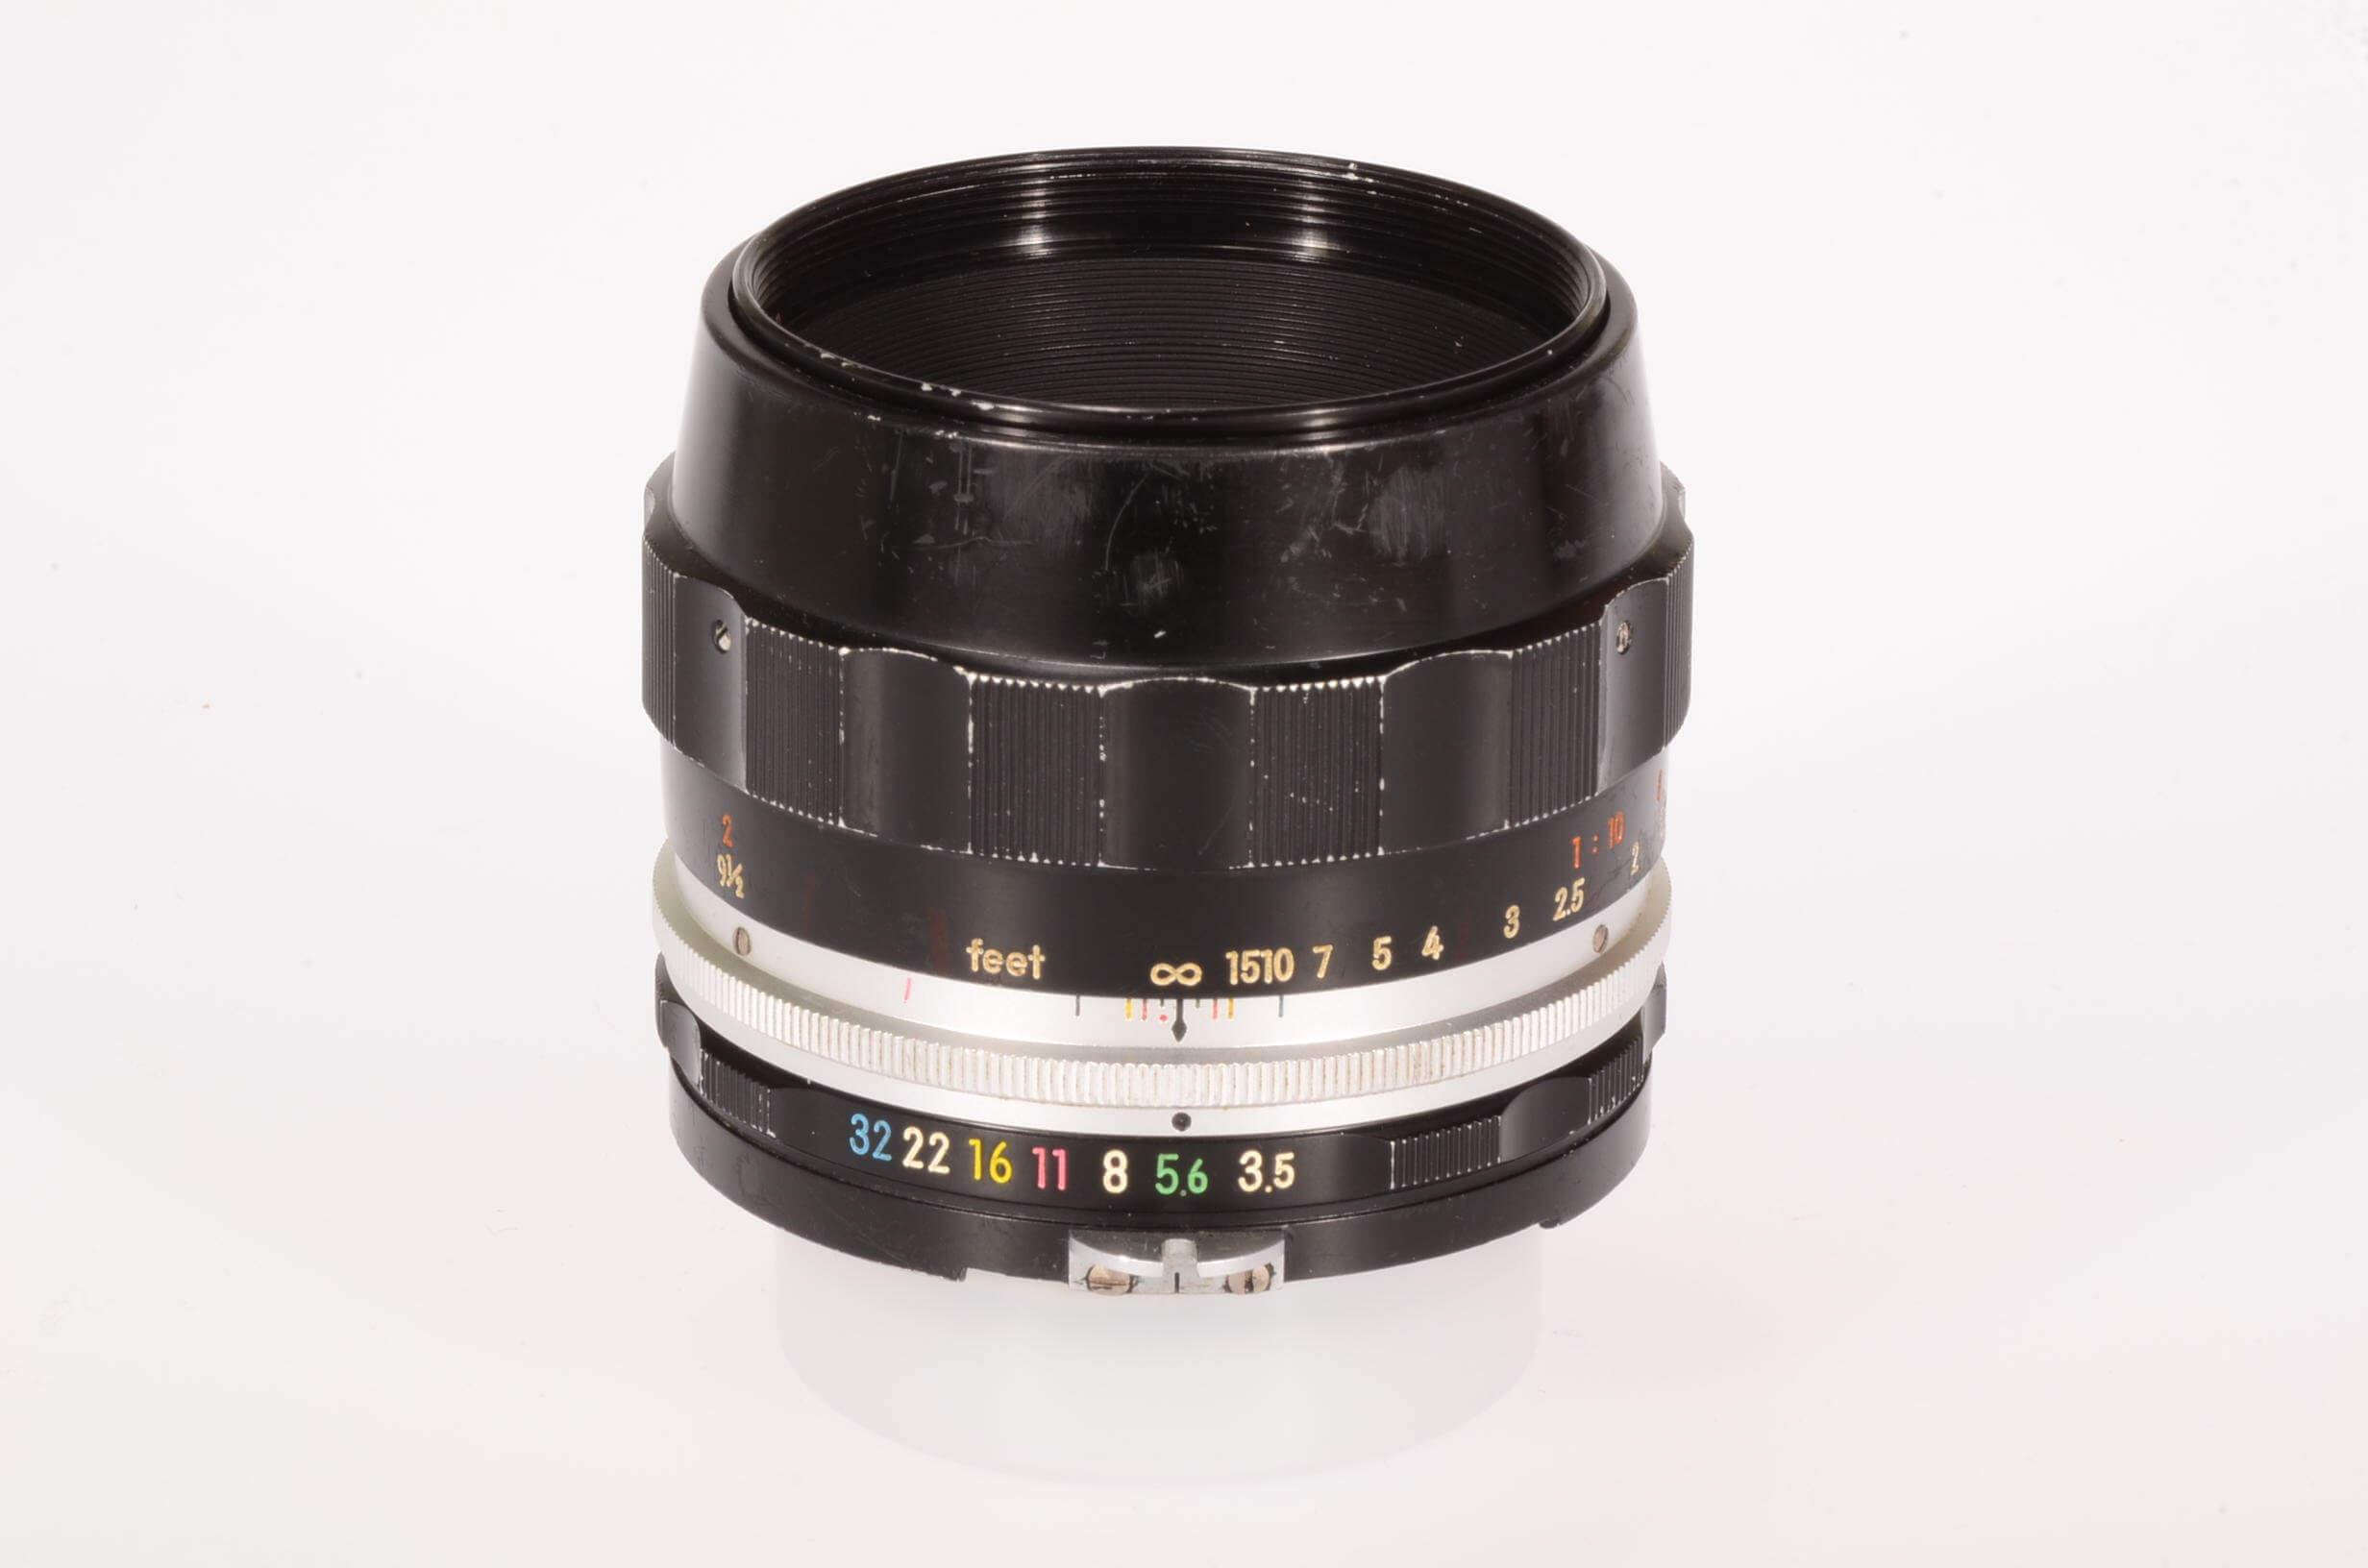 Nikon 55mm f3.5 Micro-Nikkor, pre-AI, serviced